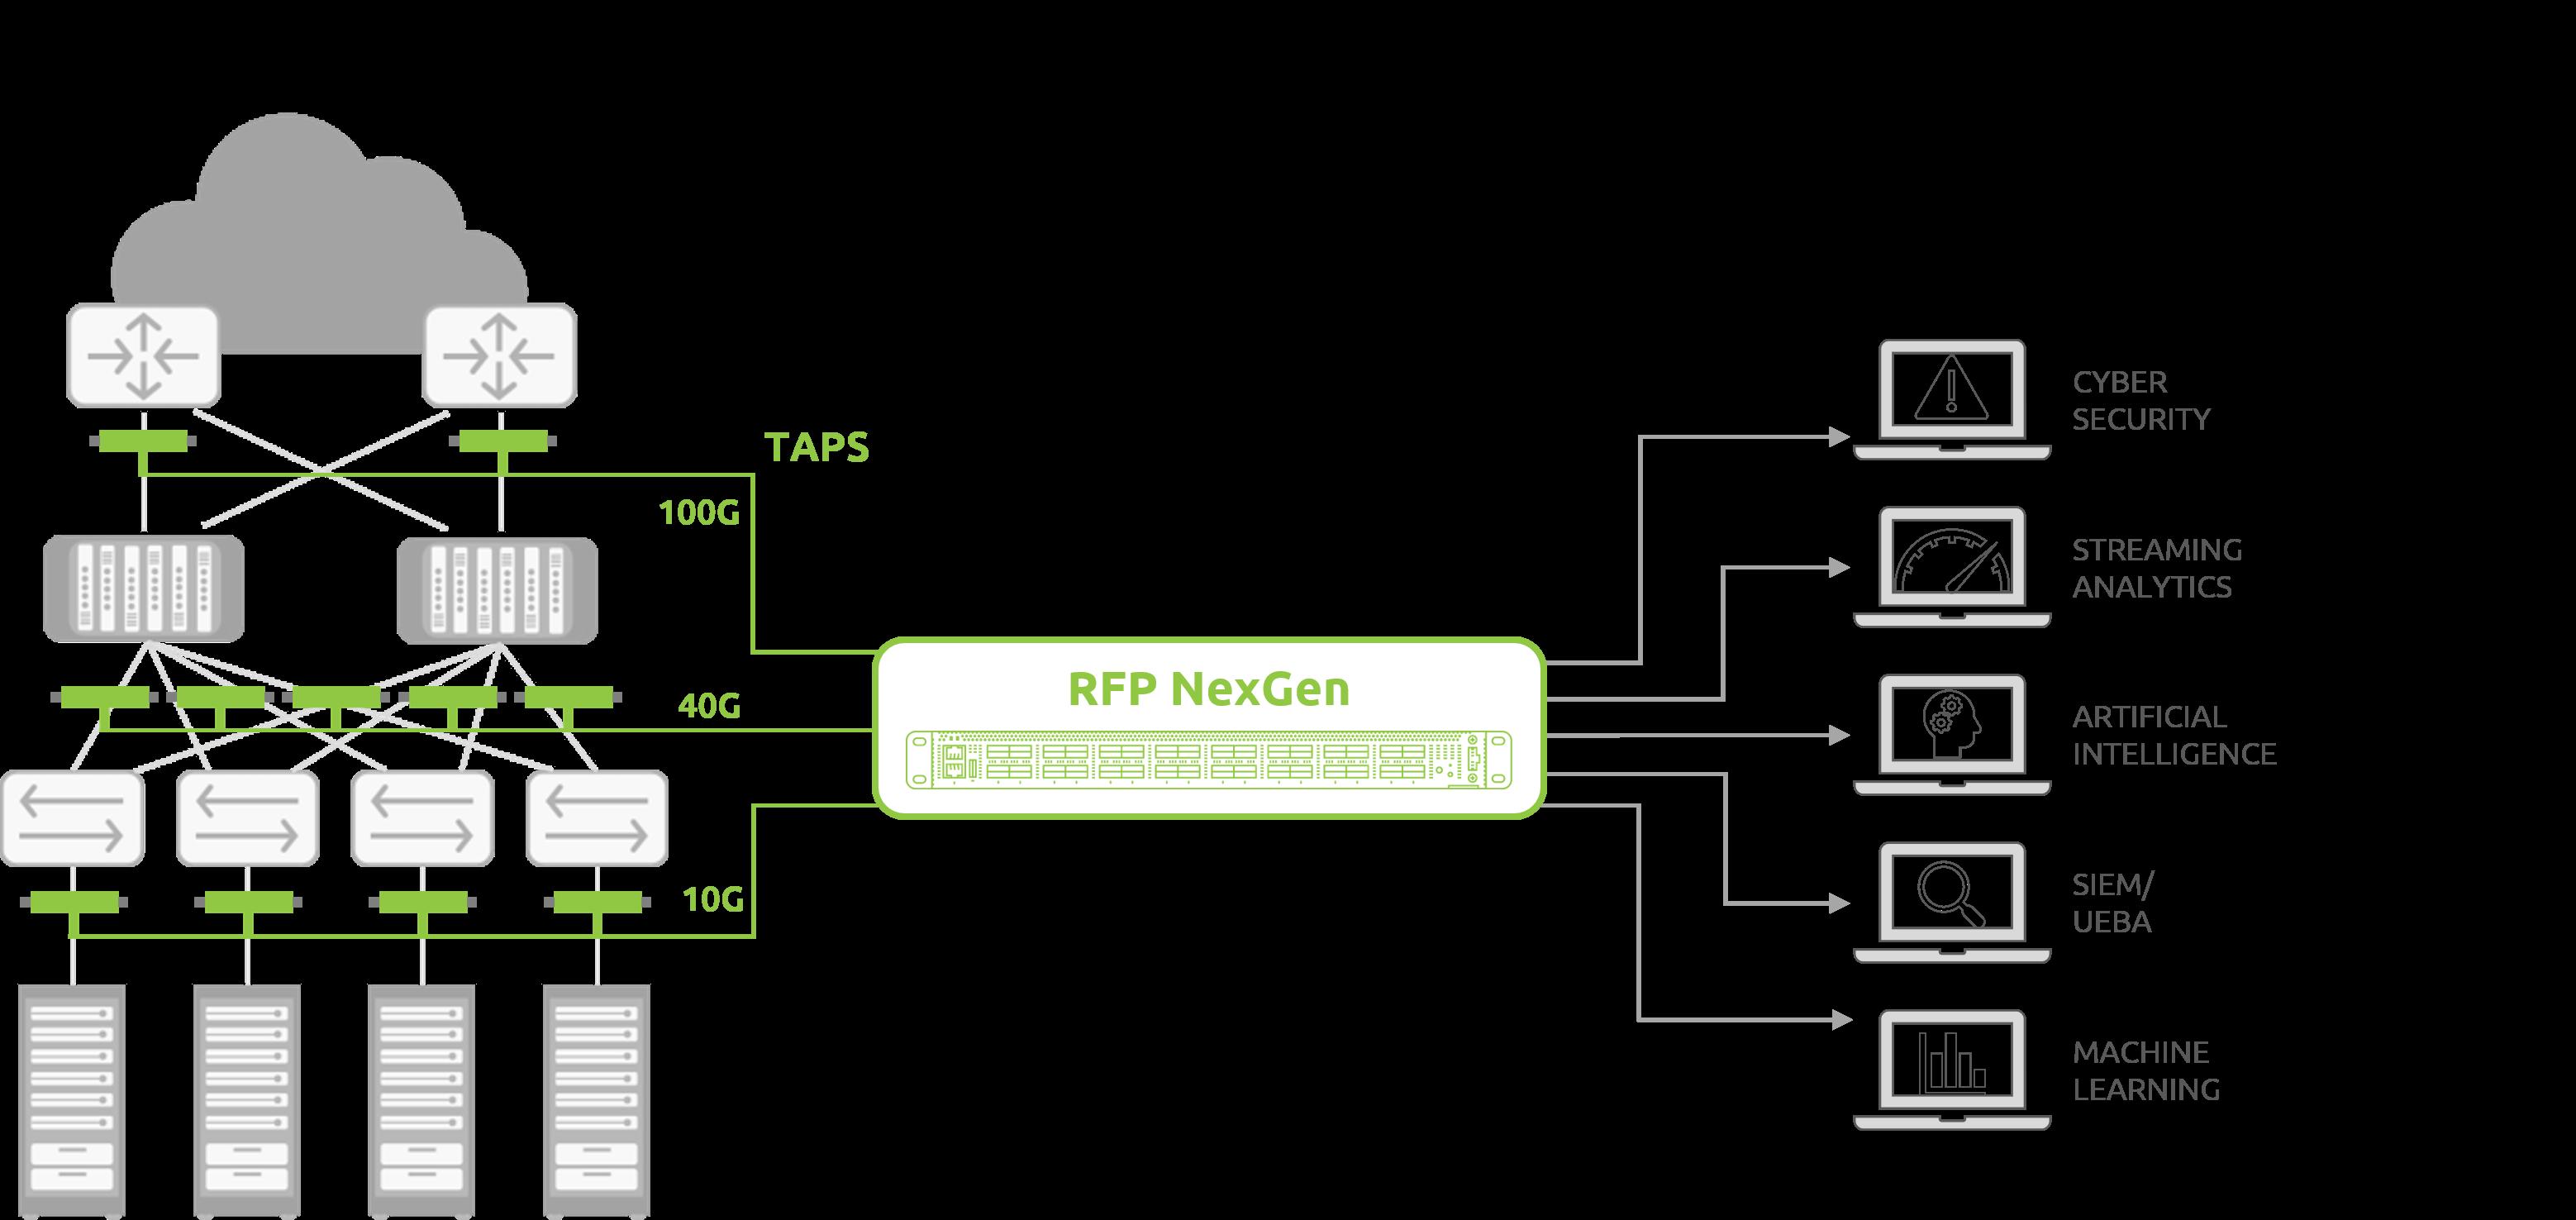 100G-Network-Monitoring-RFP-NEXGEN.png